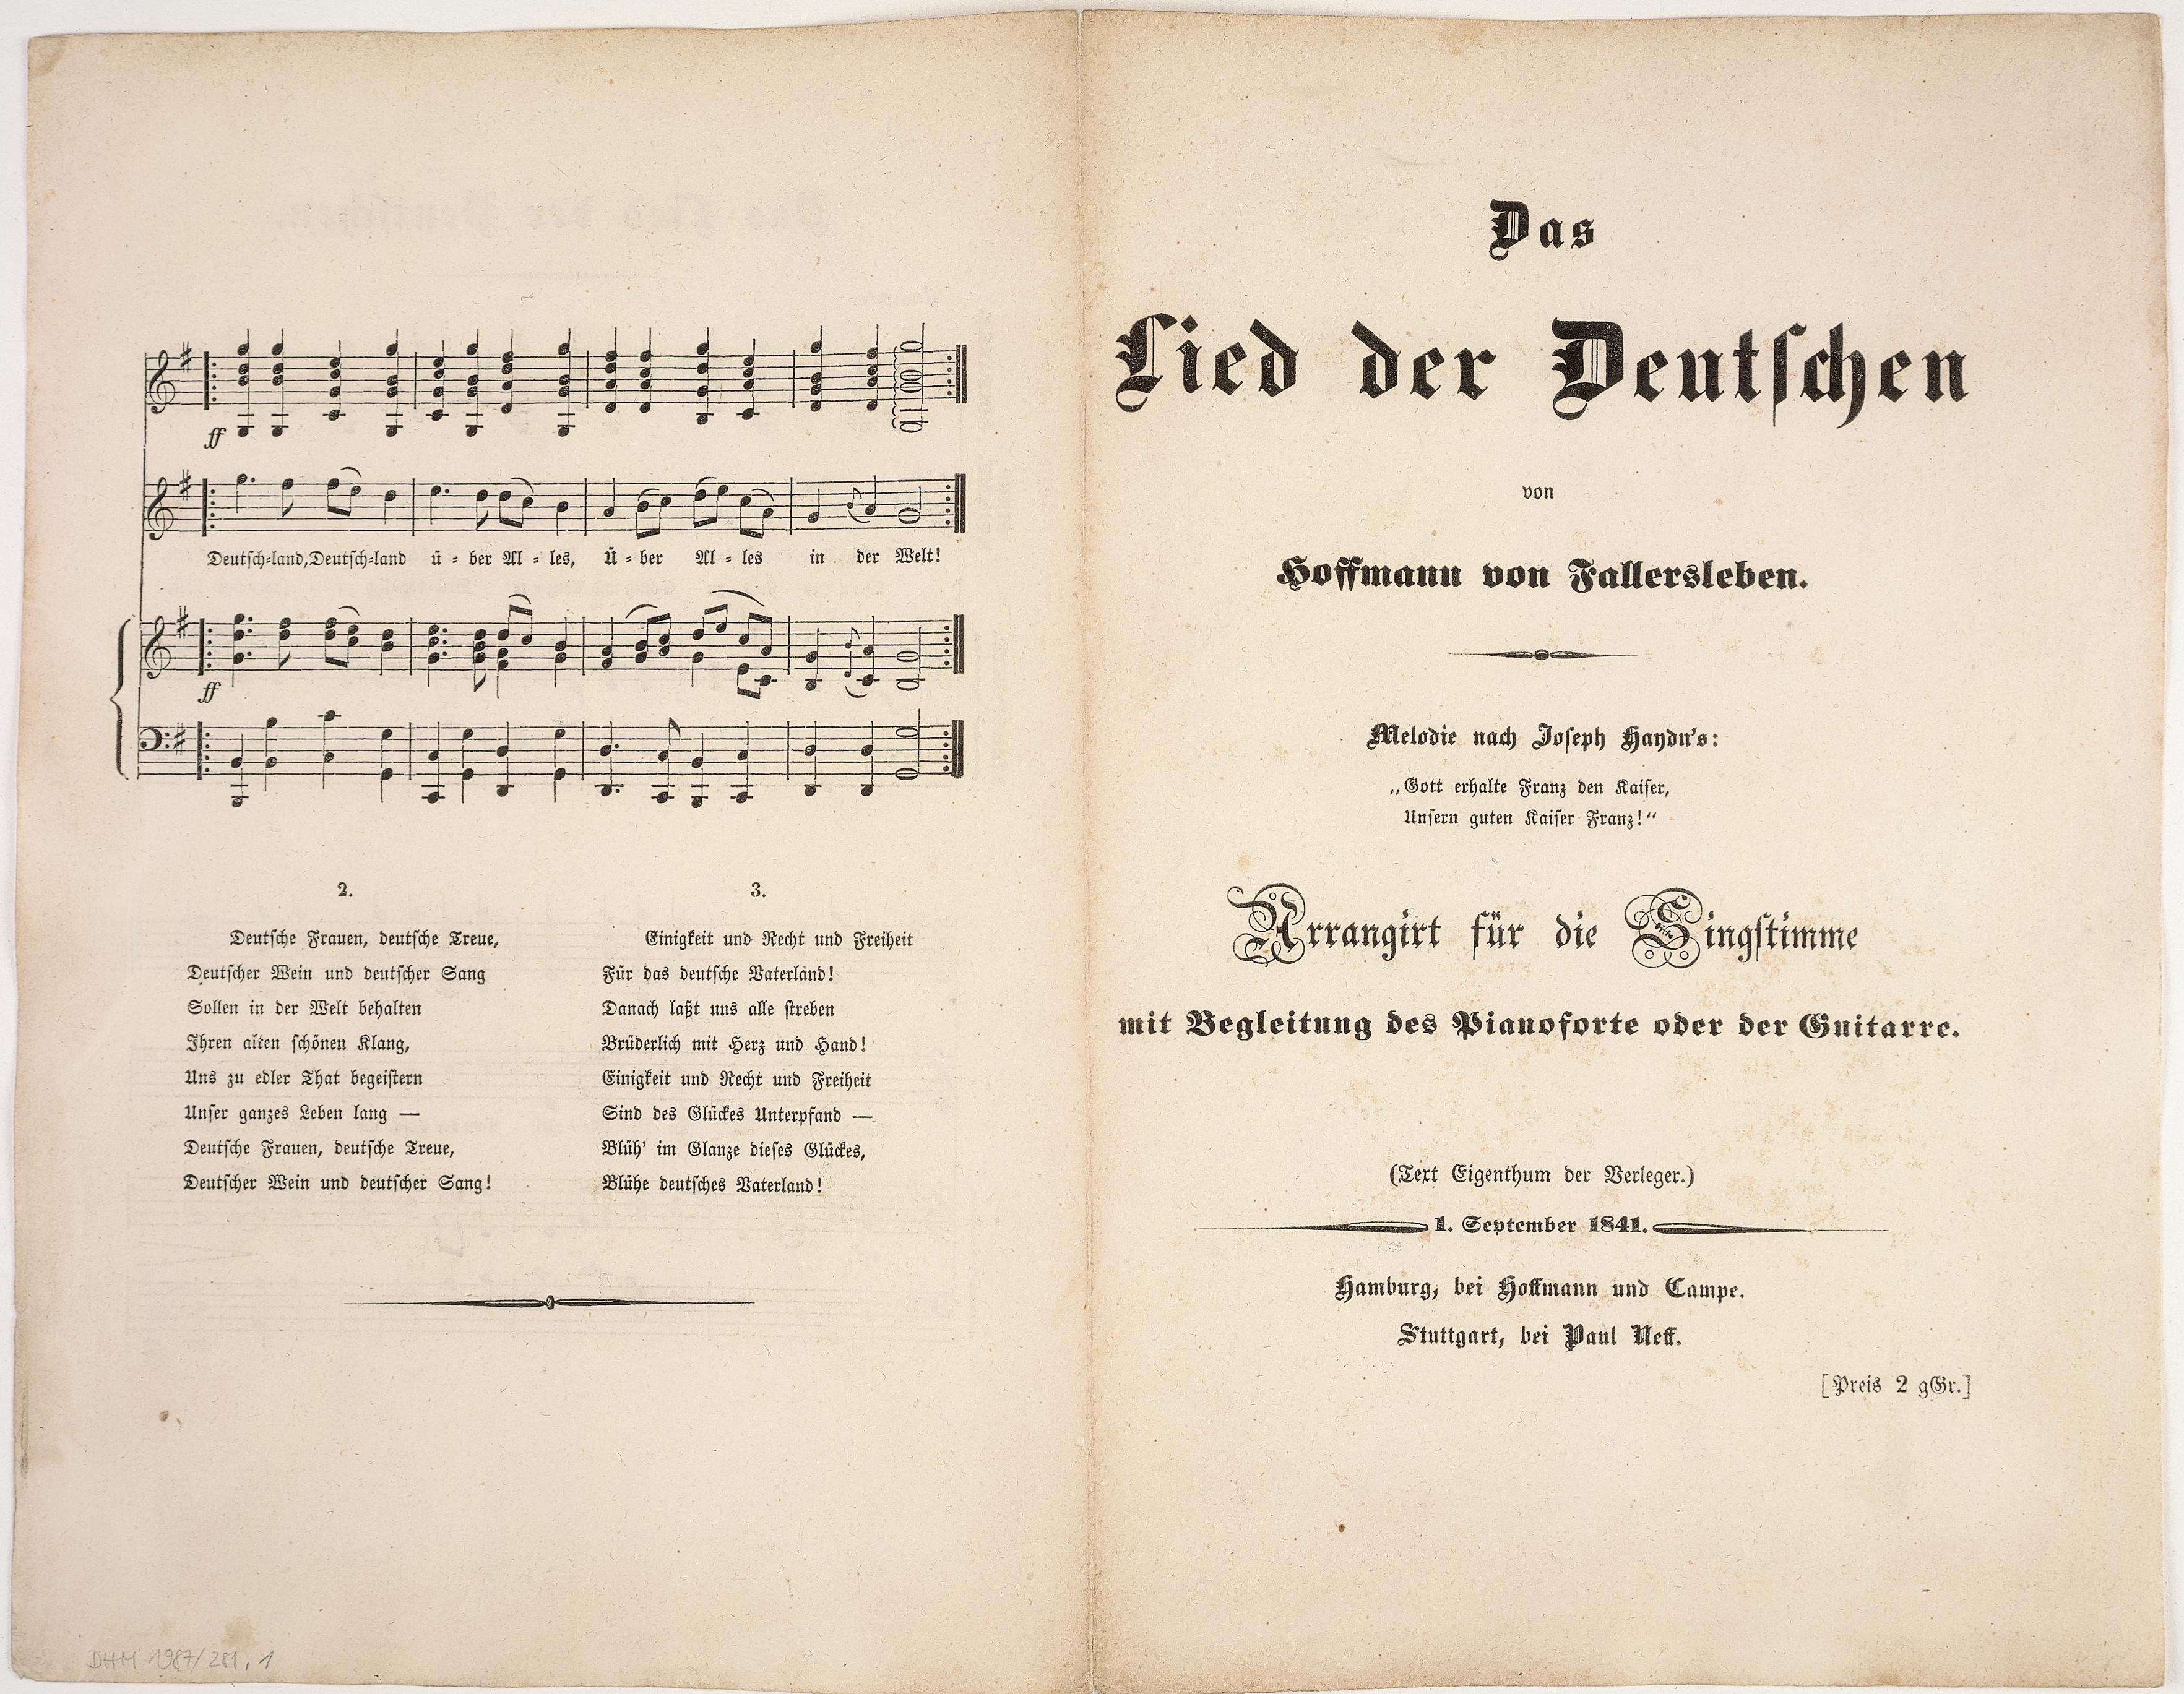 LeMO Bestand - Objekt - Textblatt